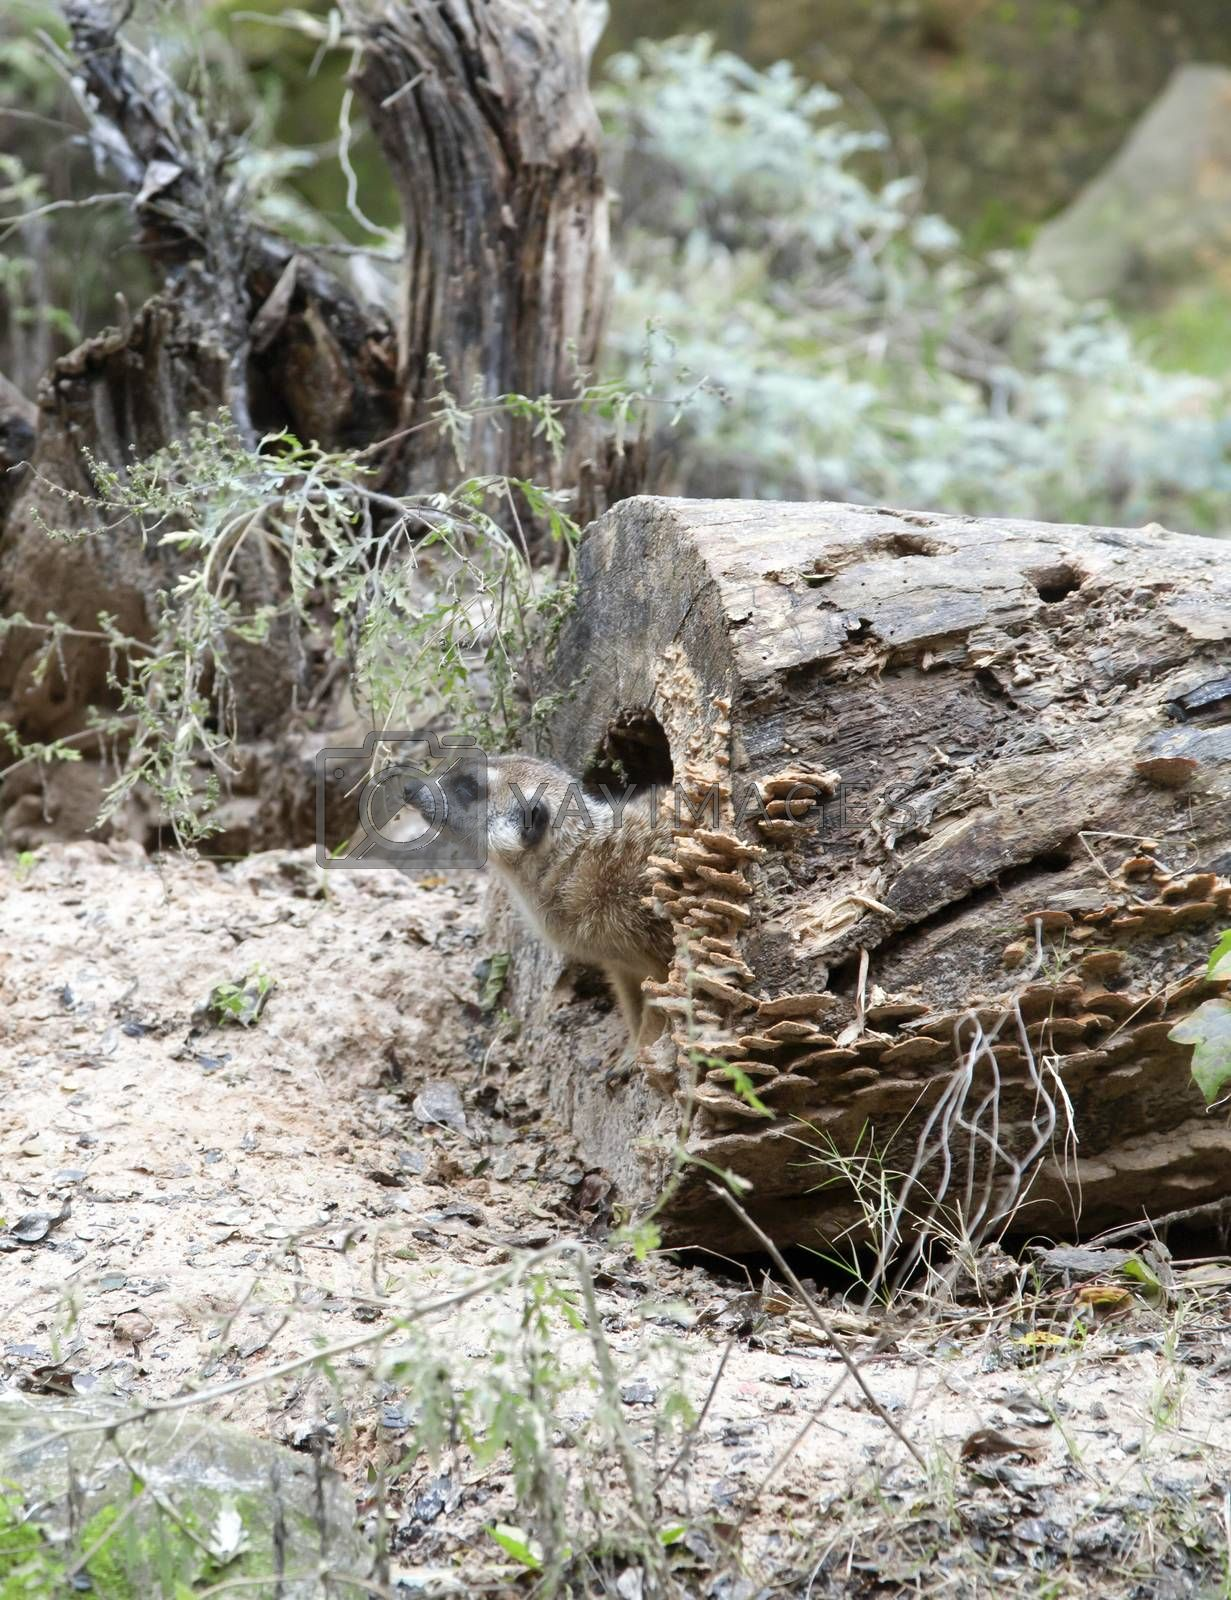 Meerkat climbing out of a log